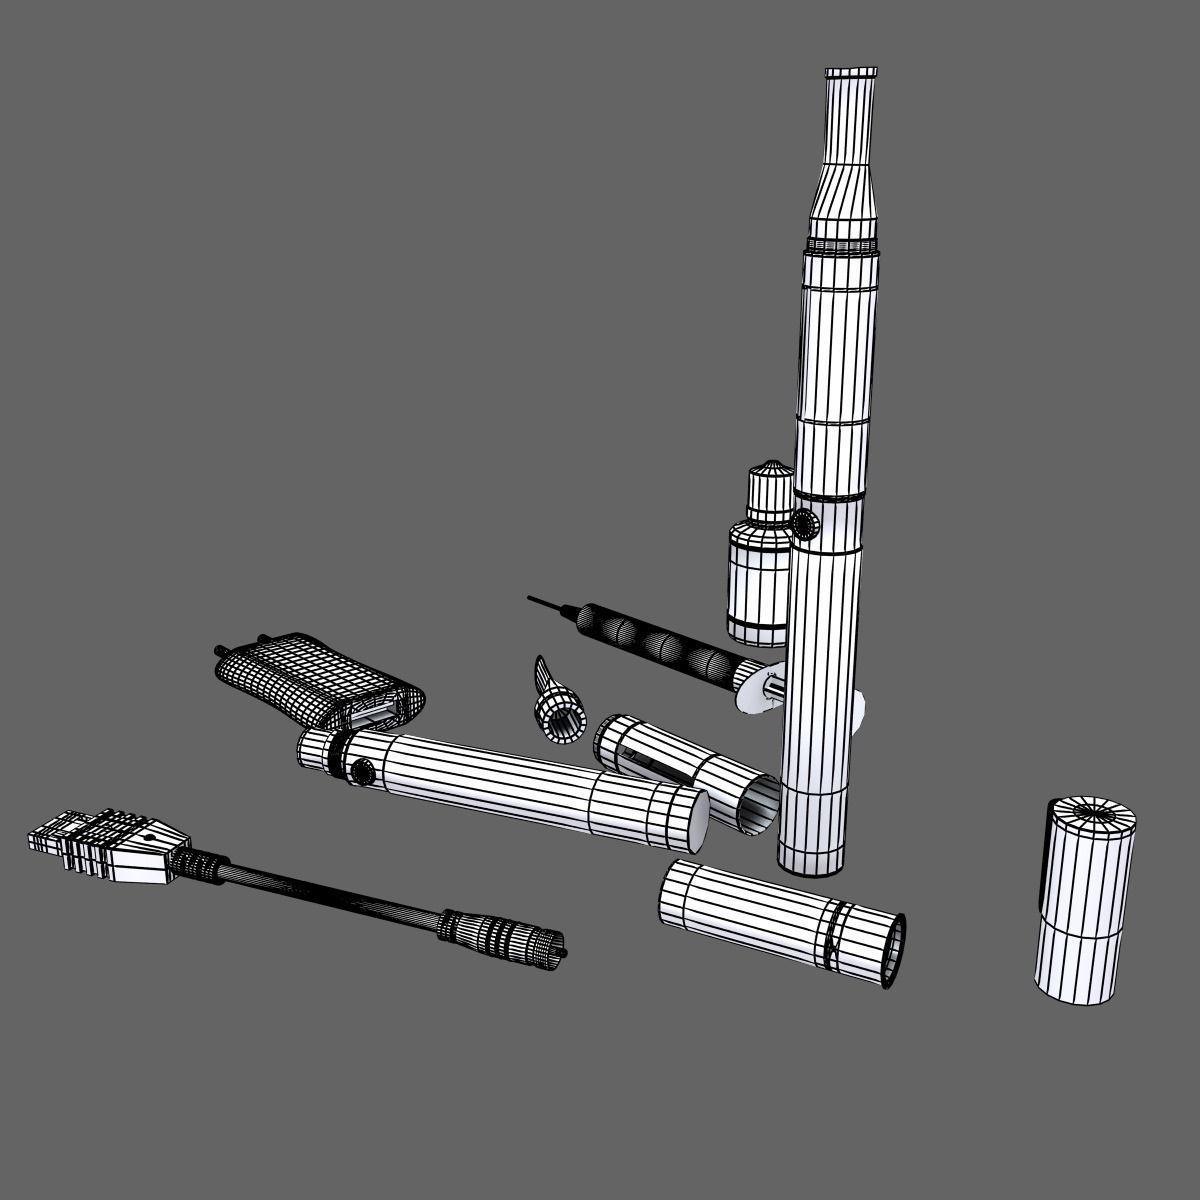 Electronic Cigarettes 3D Model MAX OBJ | CGTrader.com